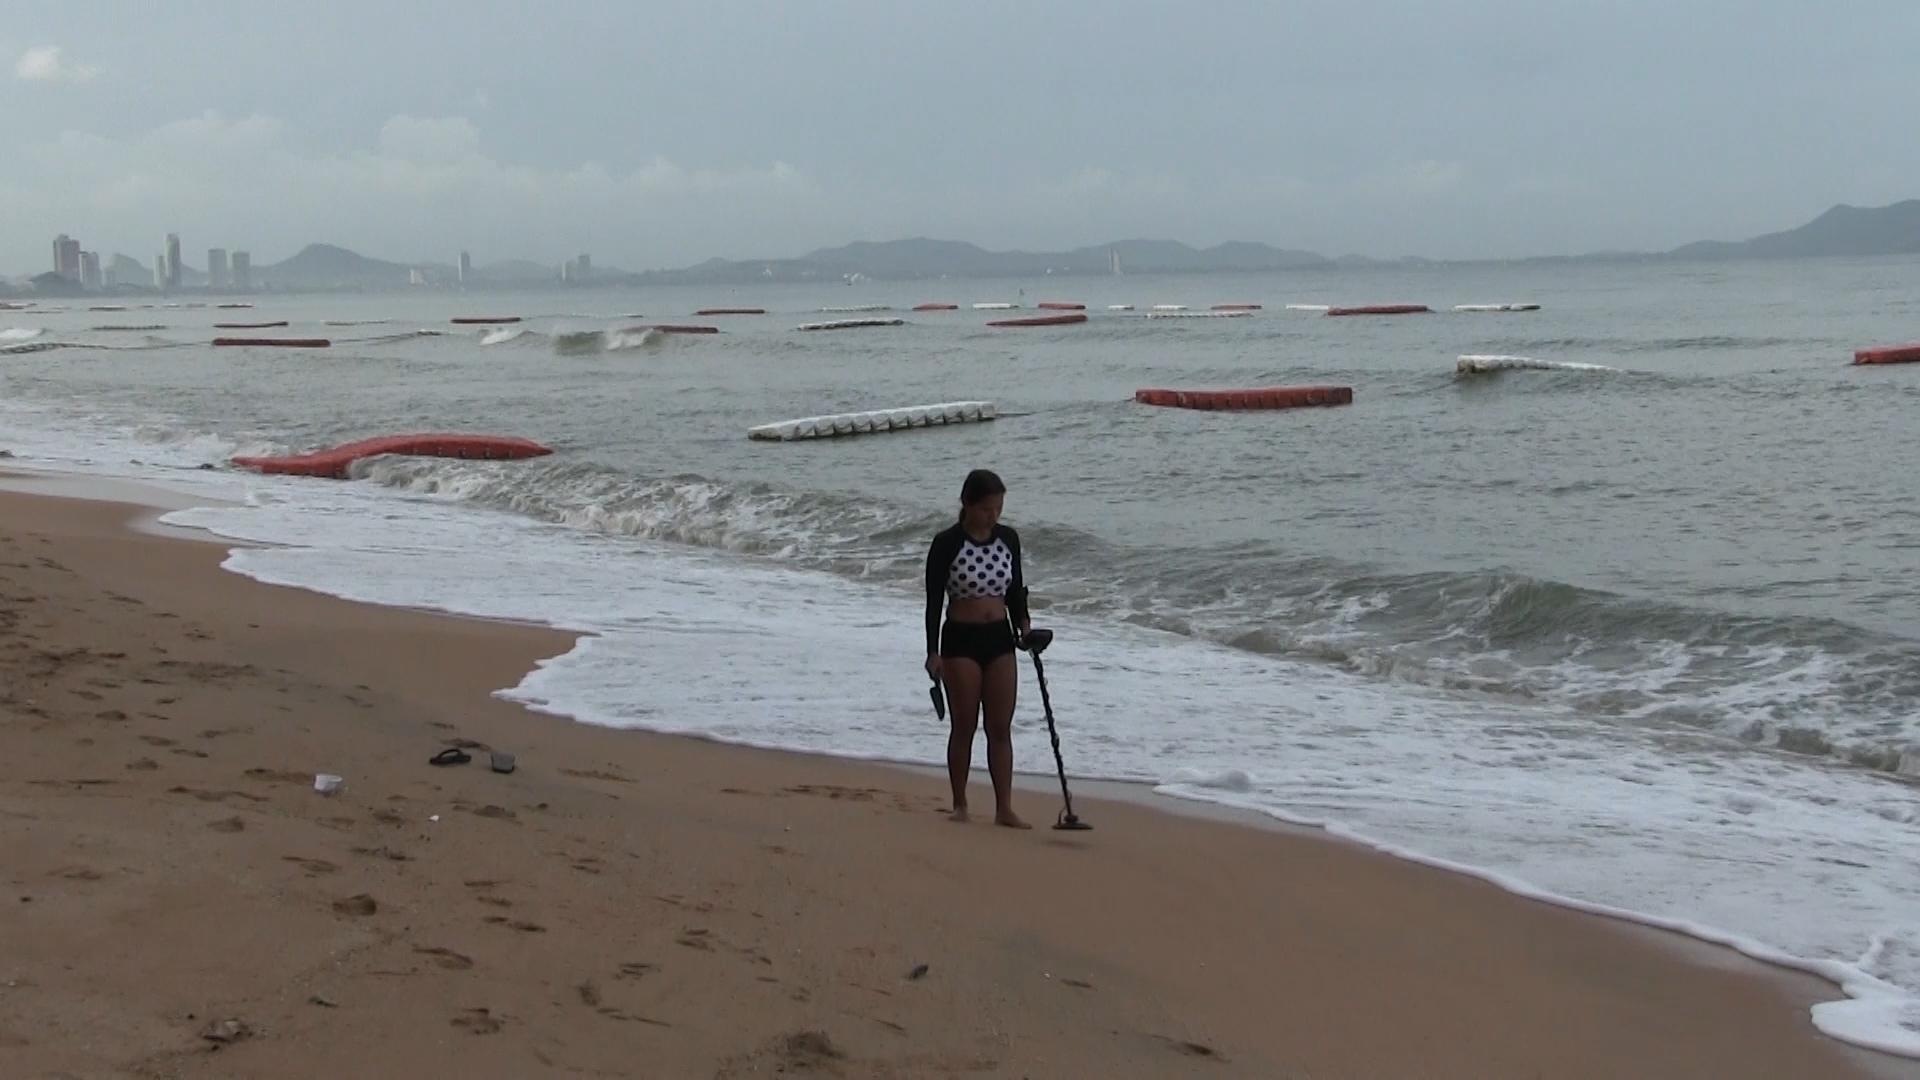 Поиск с металлоискателем на пляже в прибойной зоне. Тиаланд.